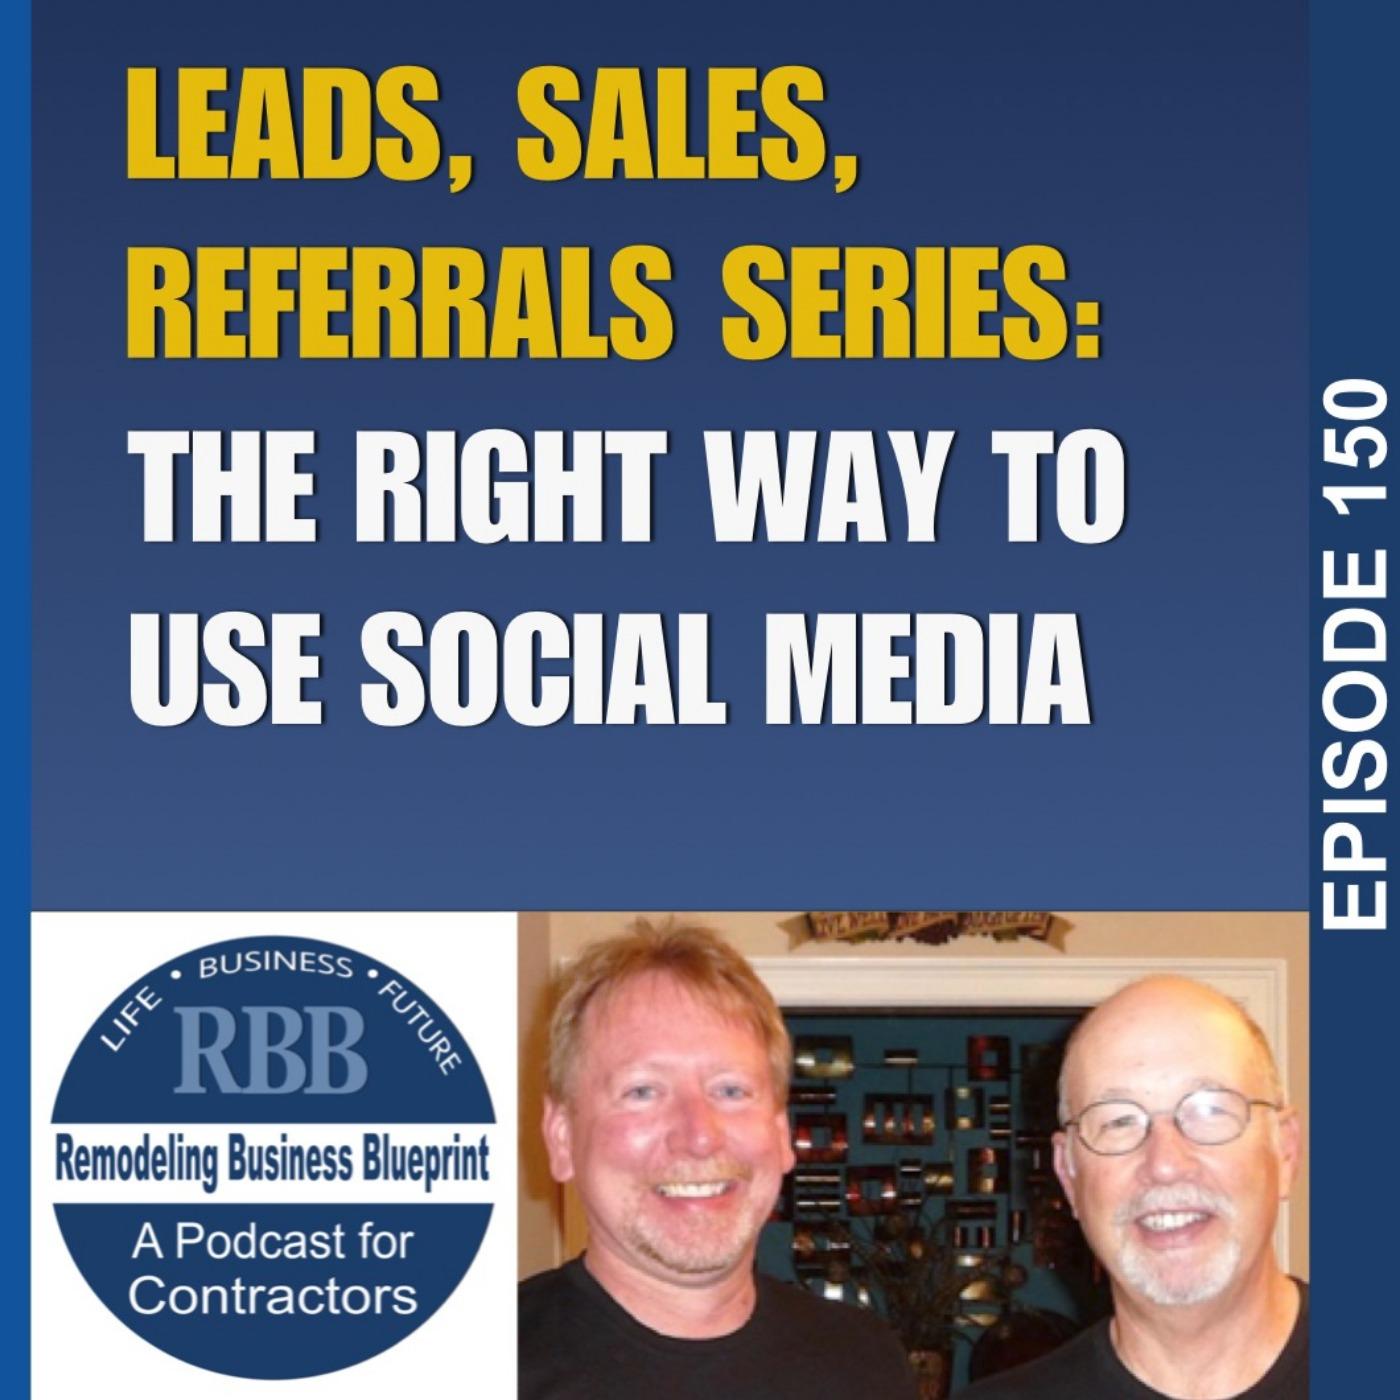 The Right Way To Use Social Media